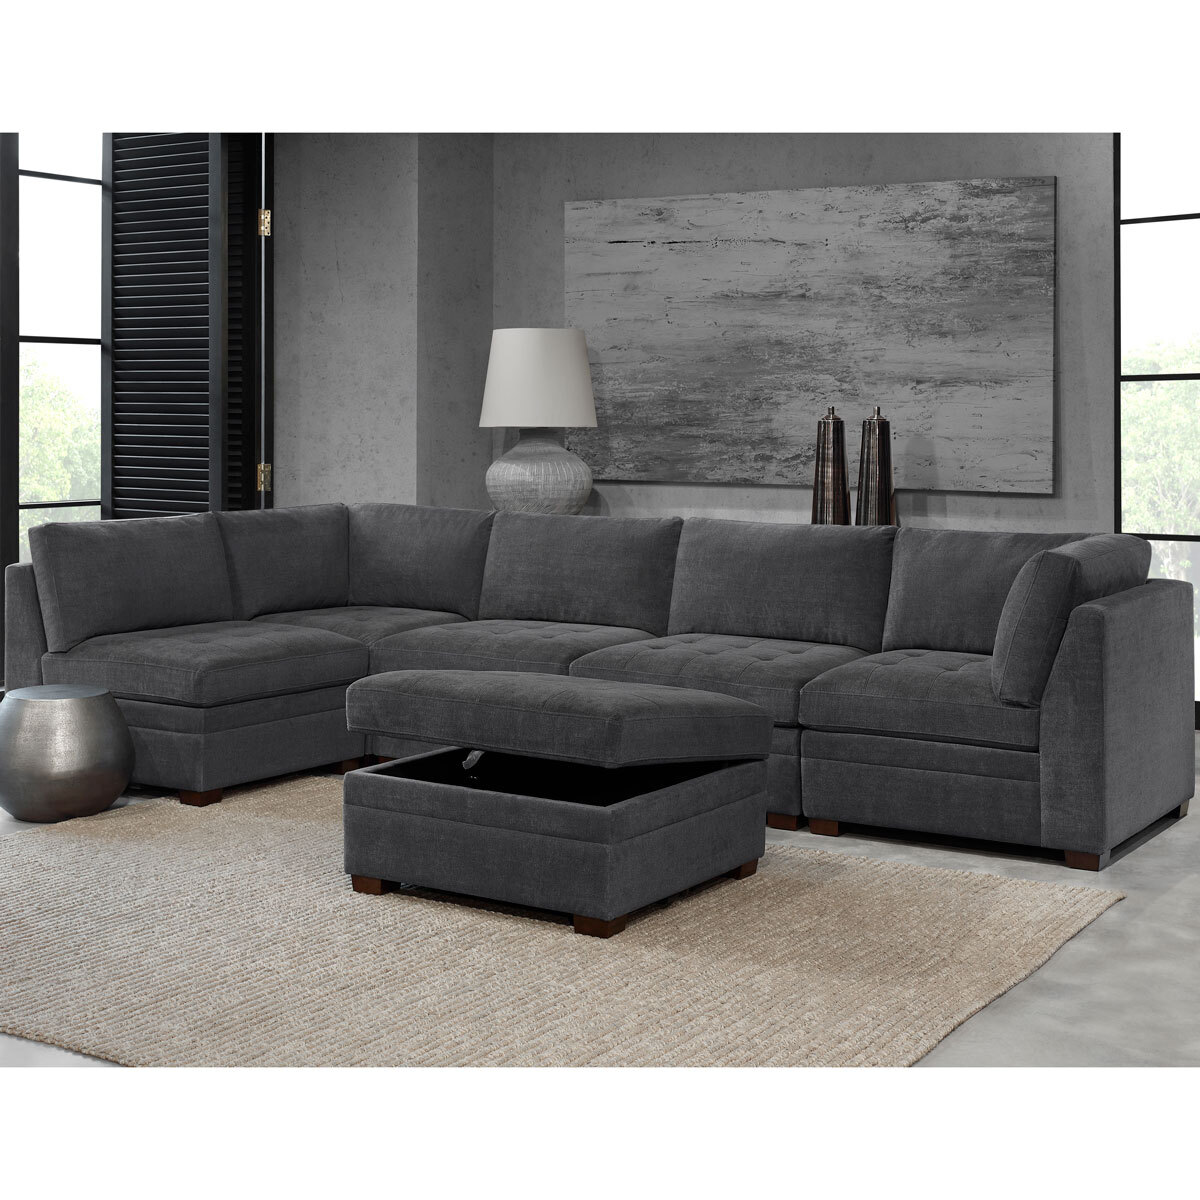 thomasville tisdale dark grey 6 piece modular fabric sofa costco uk